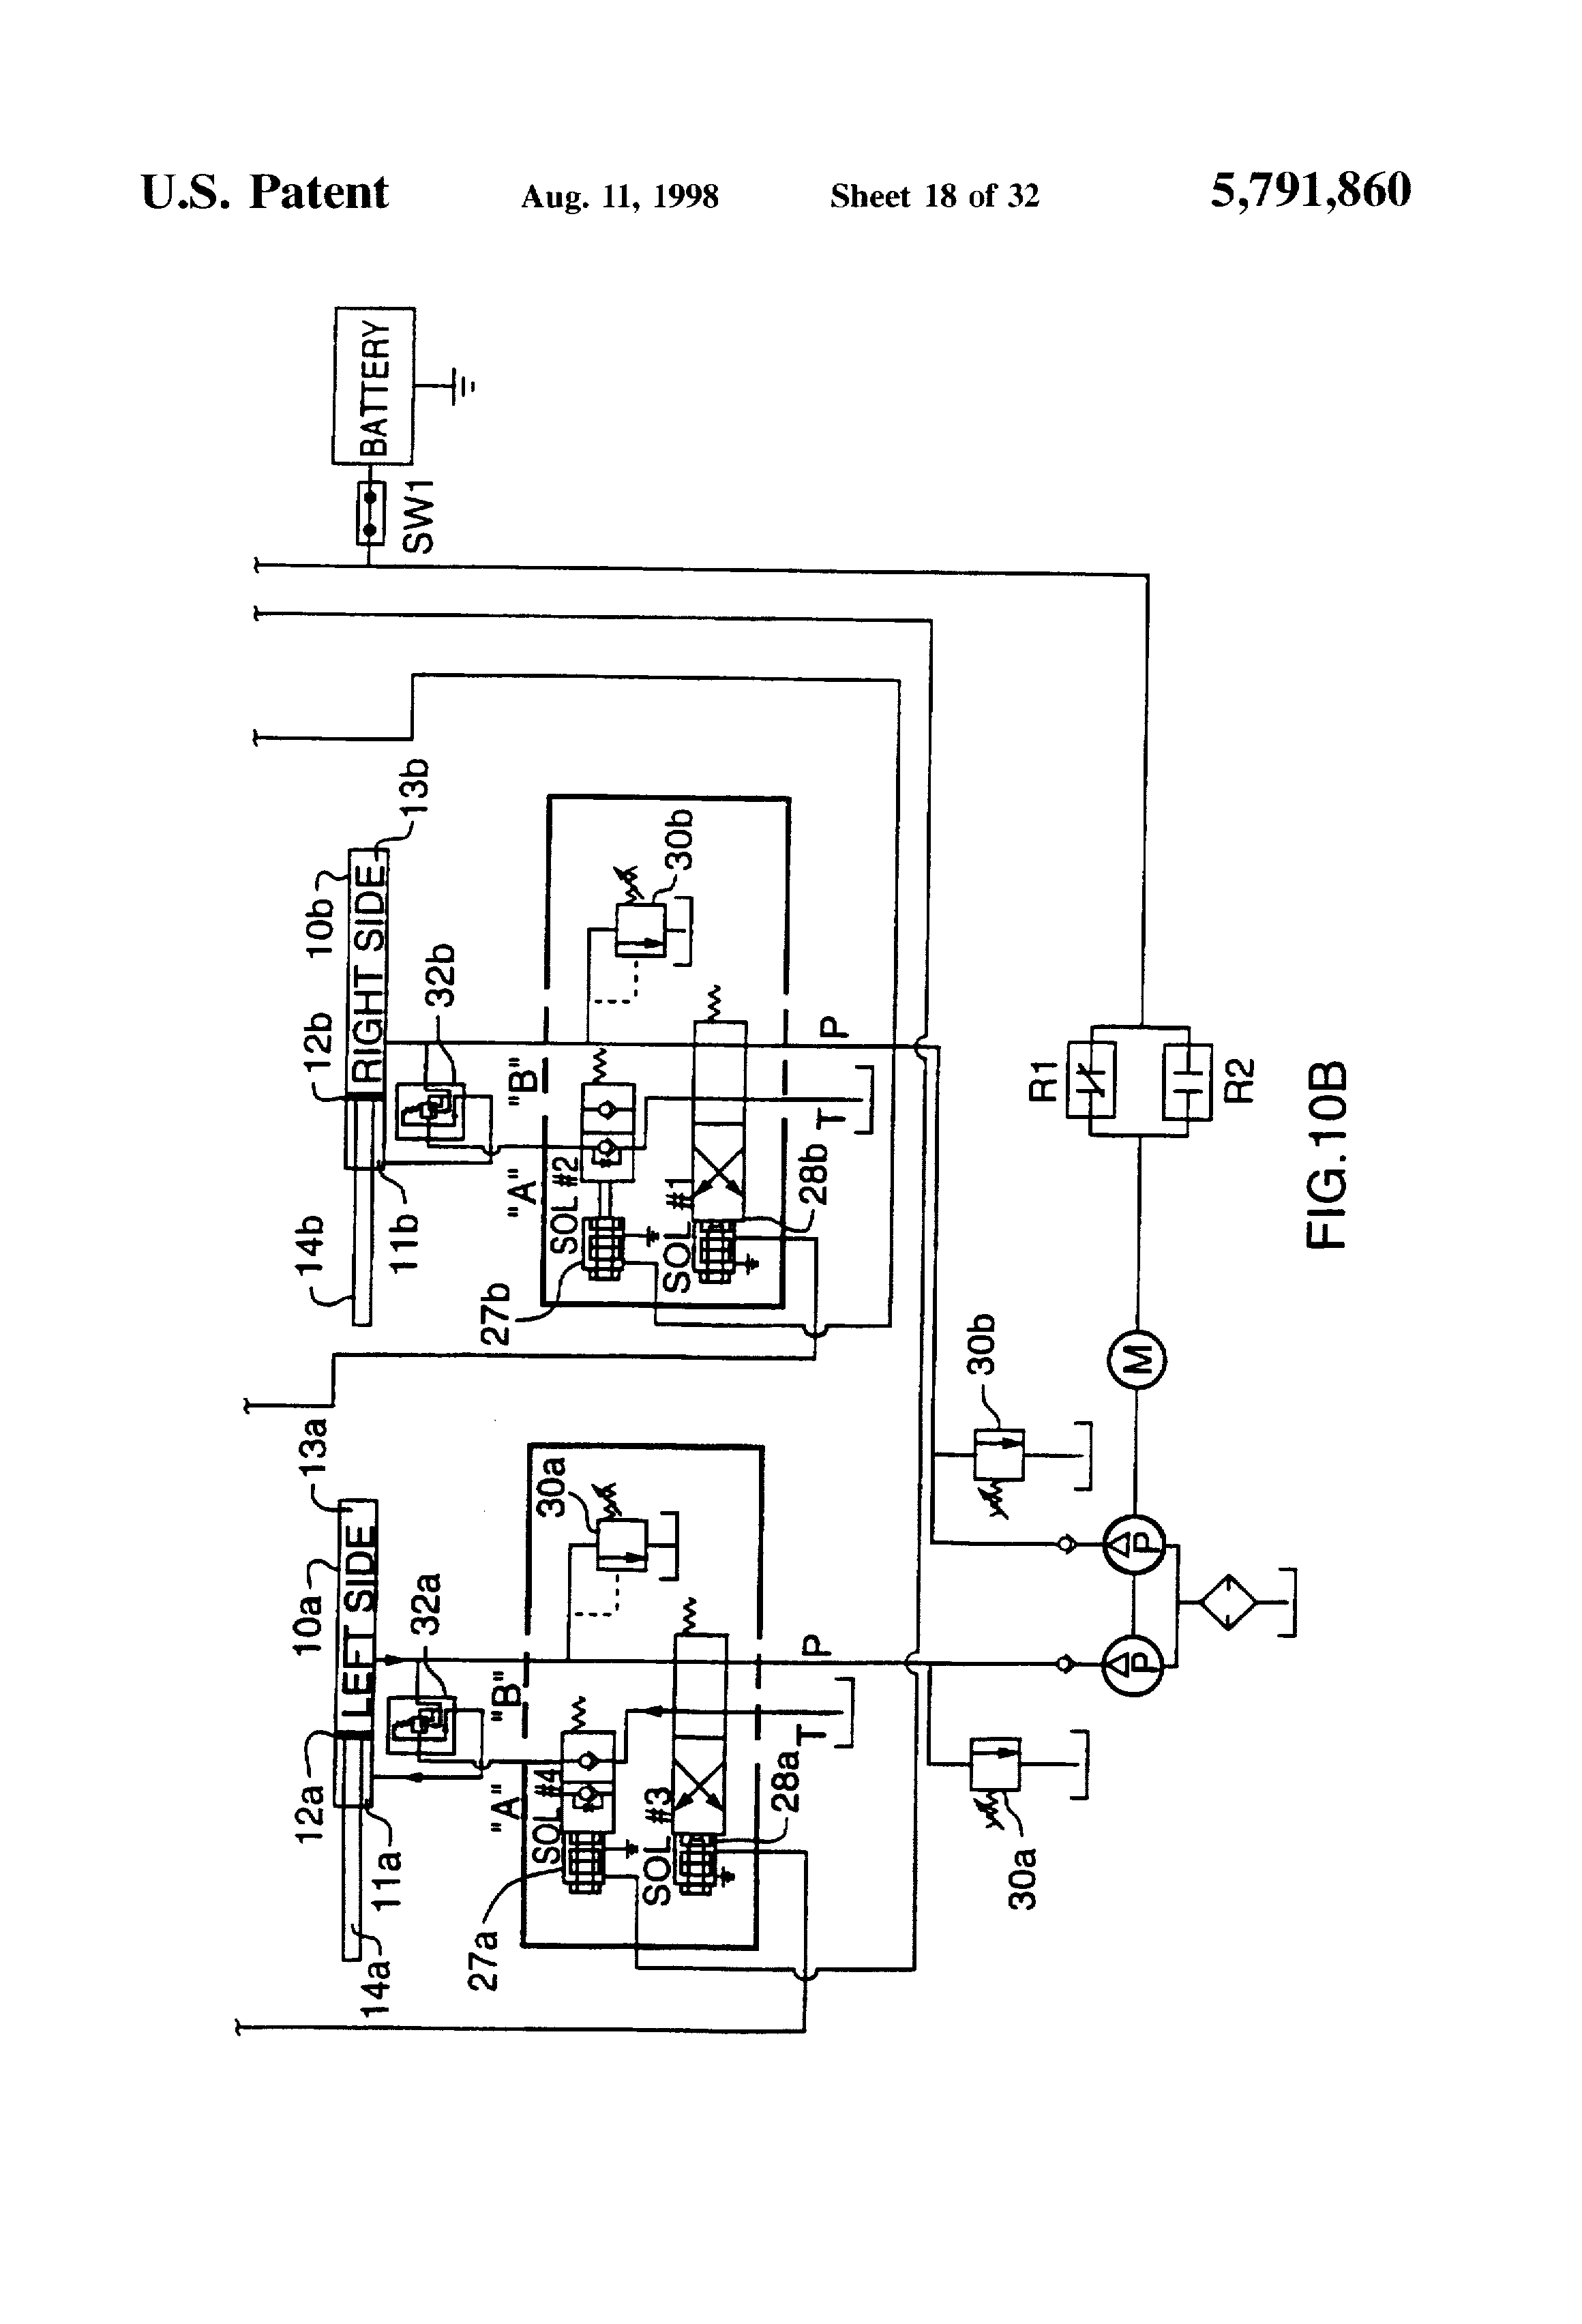 Maxon Wiring Diagram - F250 Fuel Filter Drain for Wiring Diagram SchematicsWiring Diagram Schematics